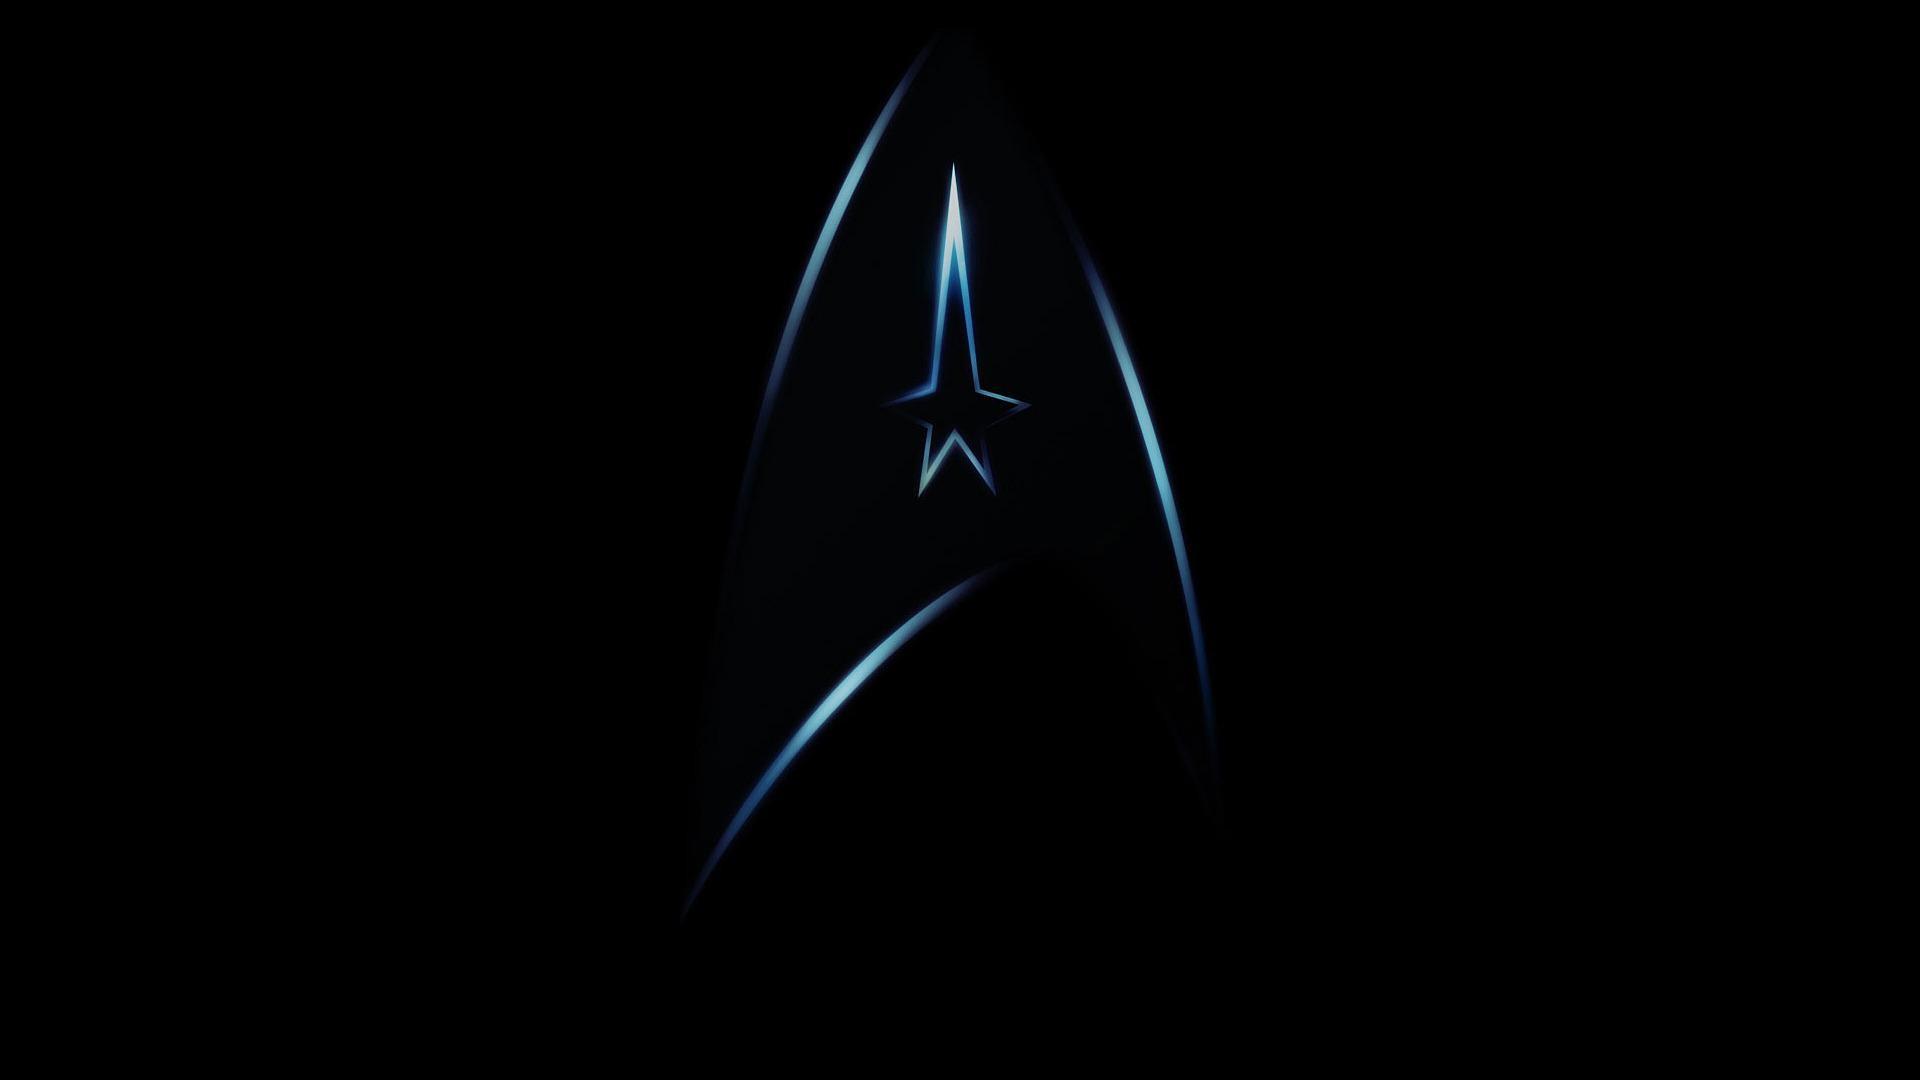 Star Trek Wallpaper Star, Trek, Star, Trek, Logos